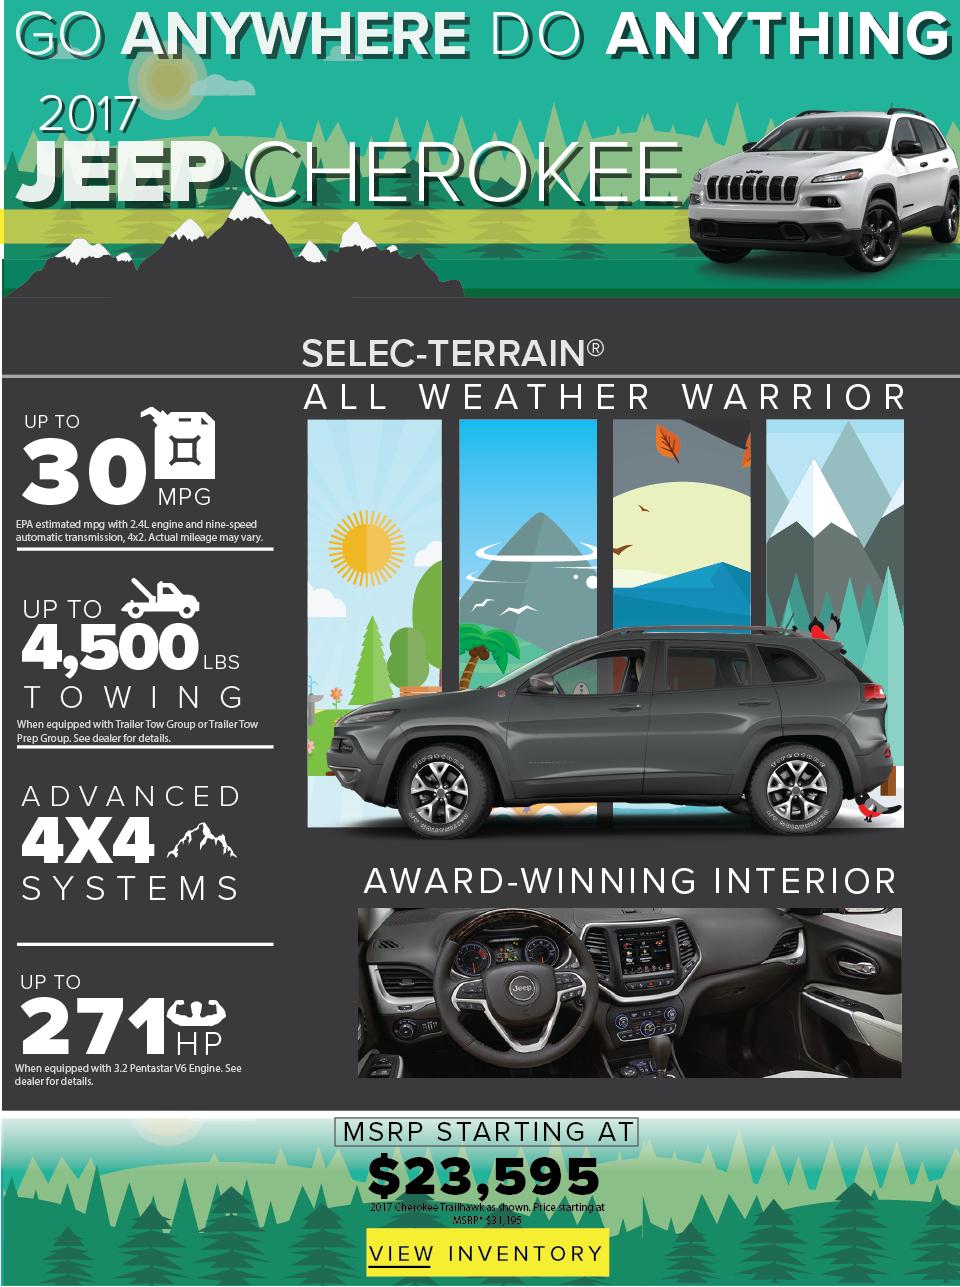 Abernethy Chrysler Jeep Dodge Ram Dealership In Lincolnton